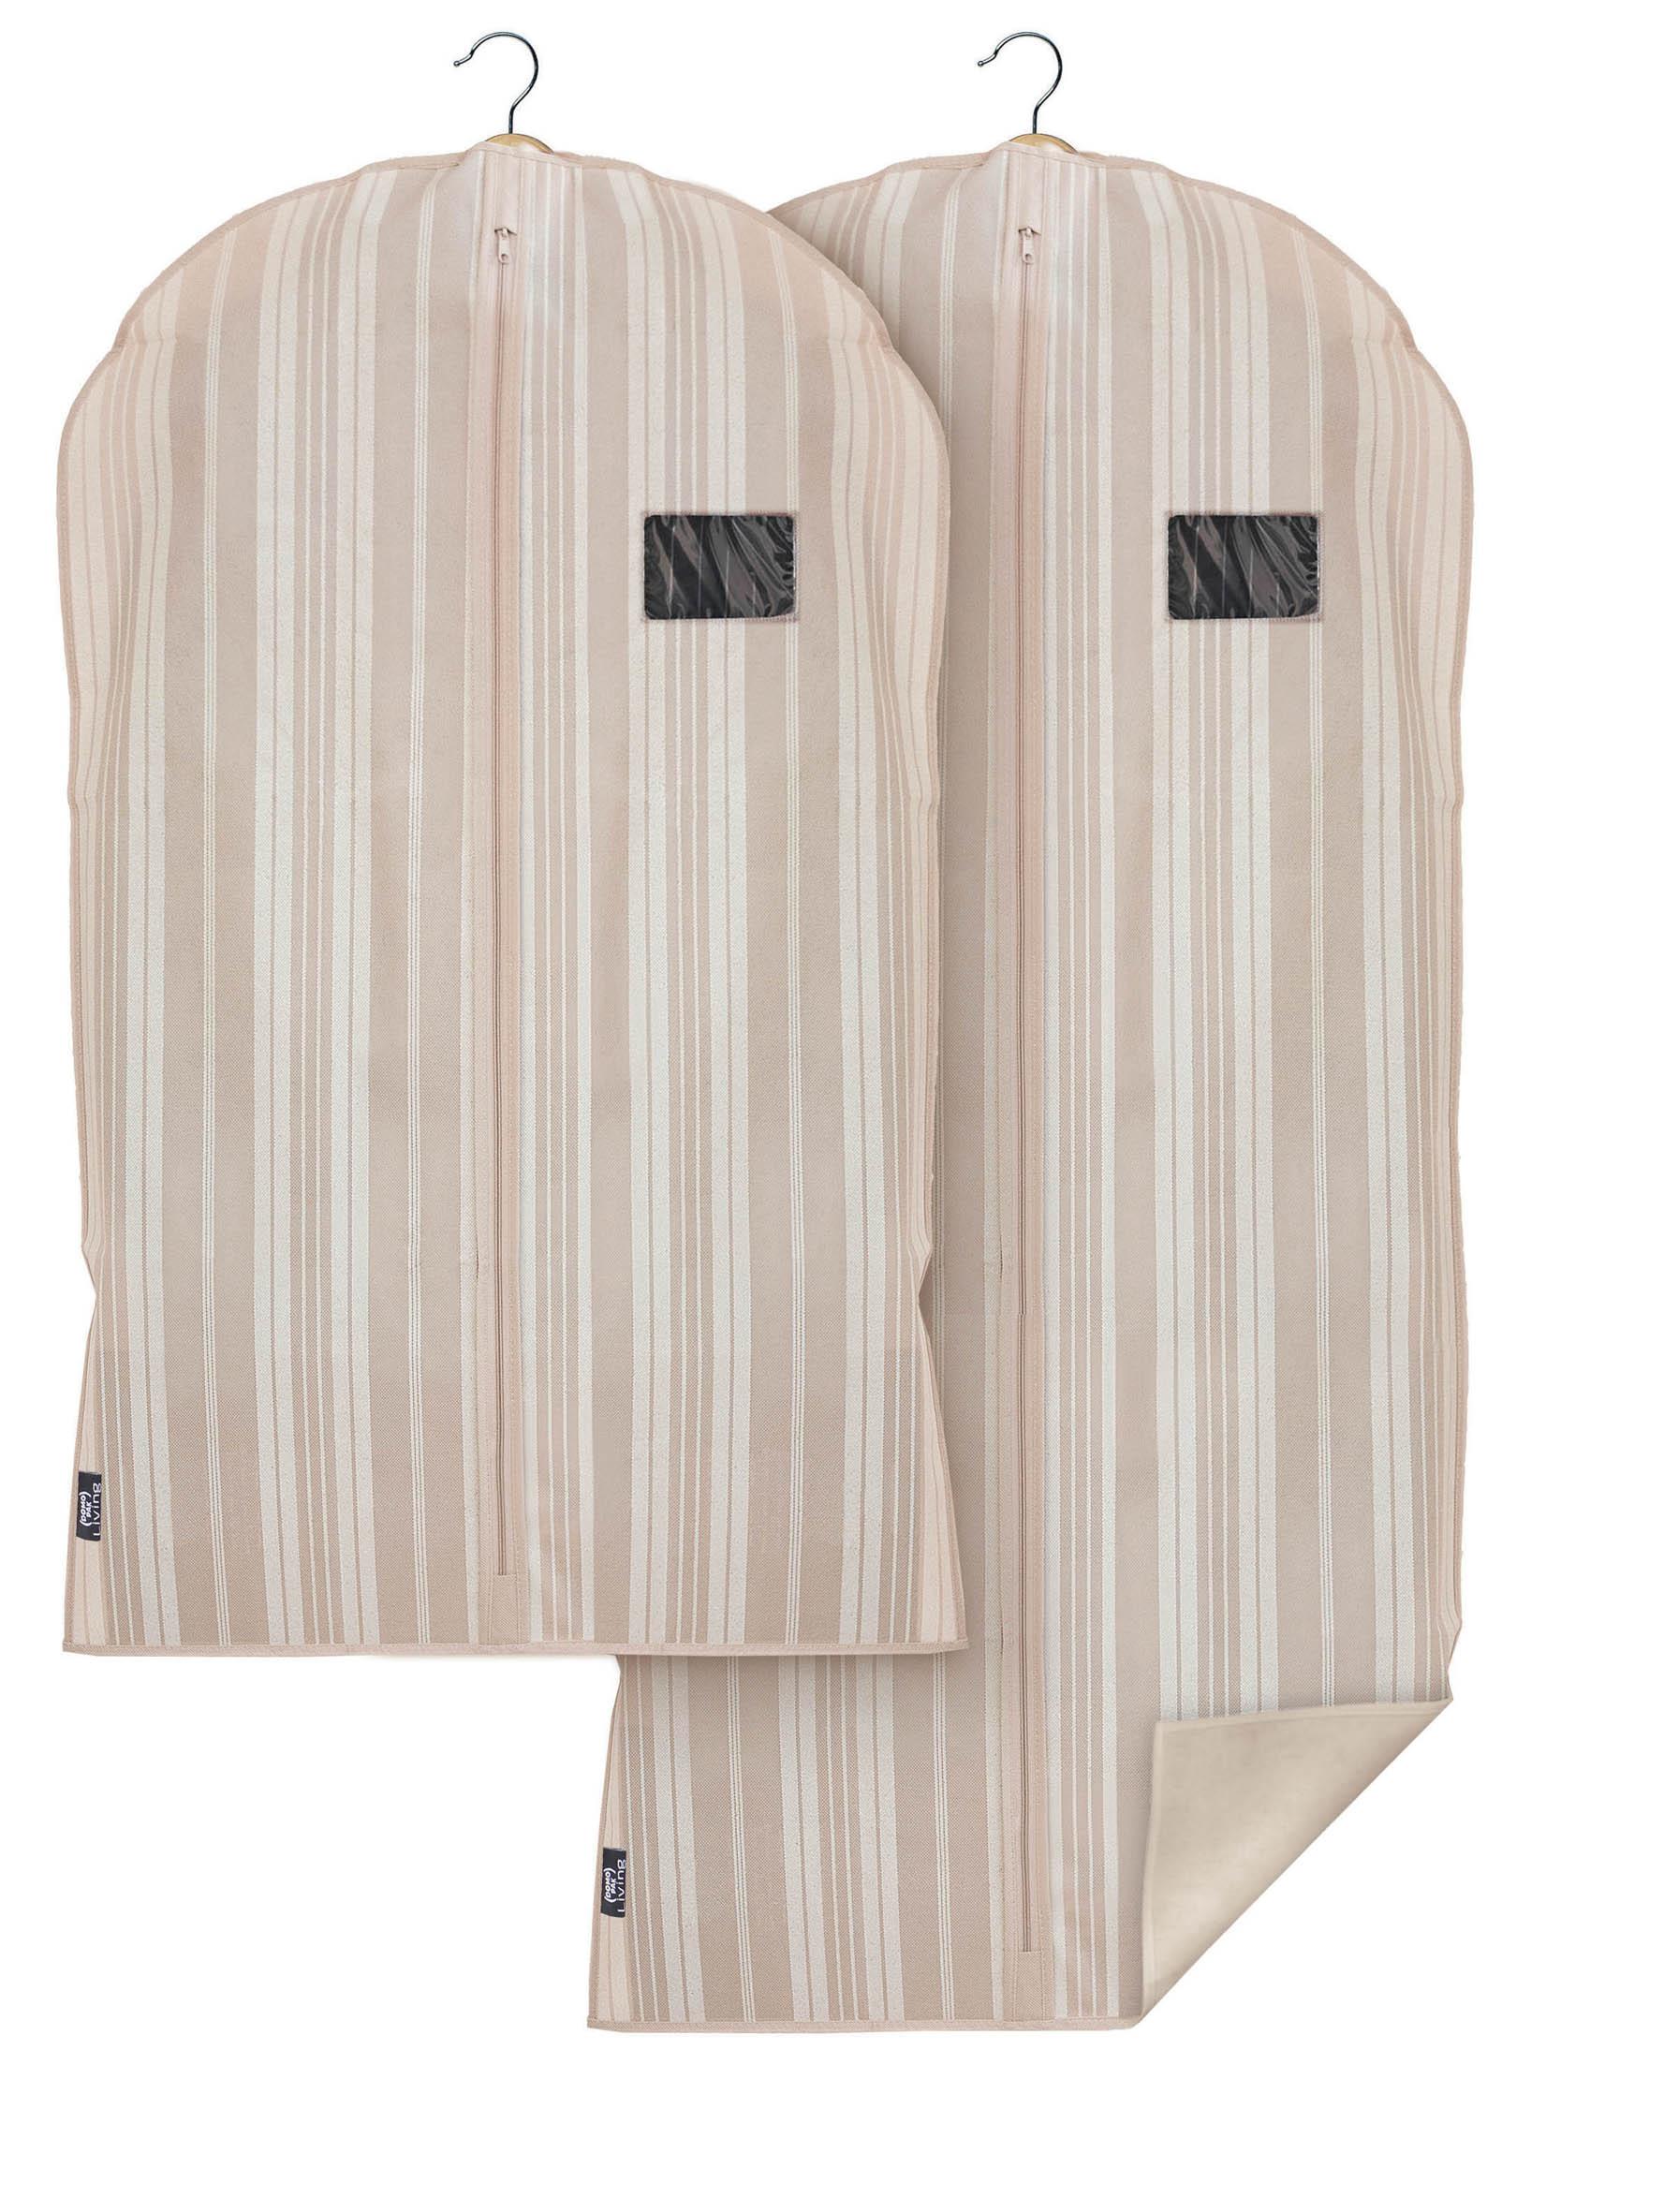 DOMOPAK Living Ochranný obaly na oblek a šaty s uzavíráním na zip set 2ks